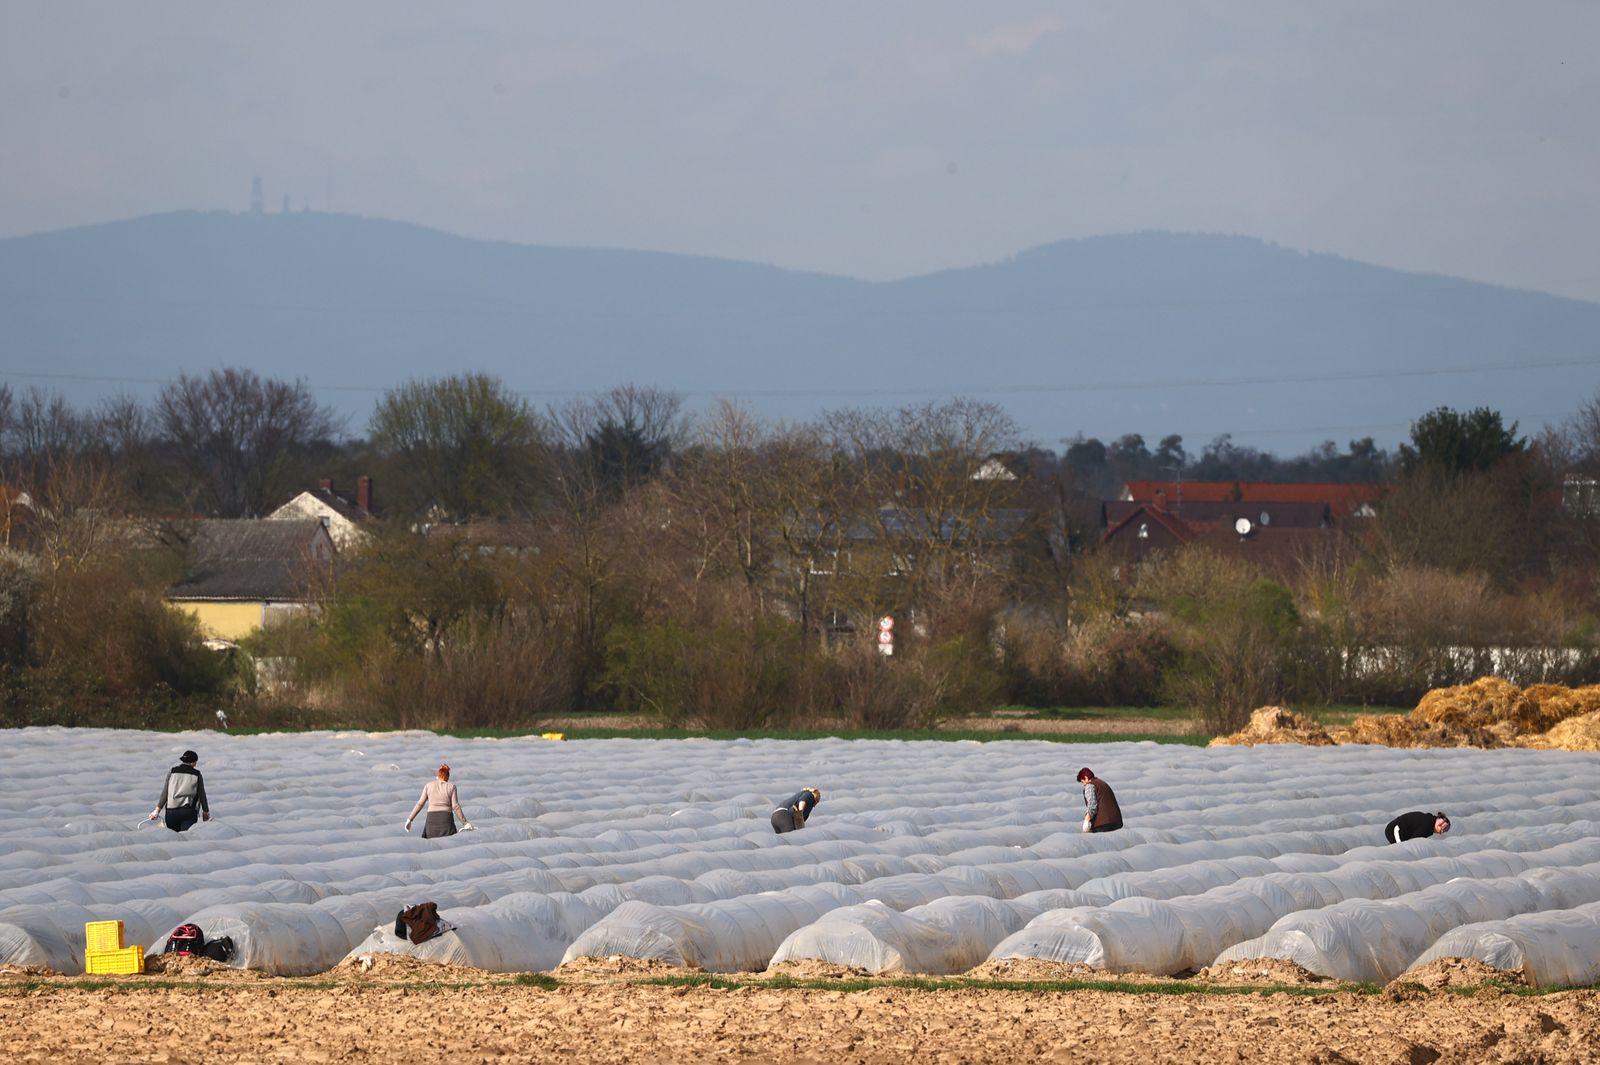 Asparagus is harvested on a field in Weiterstadt near Frankfurt